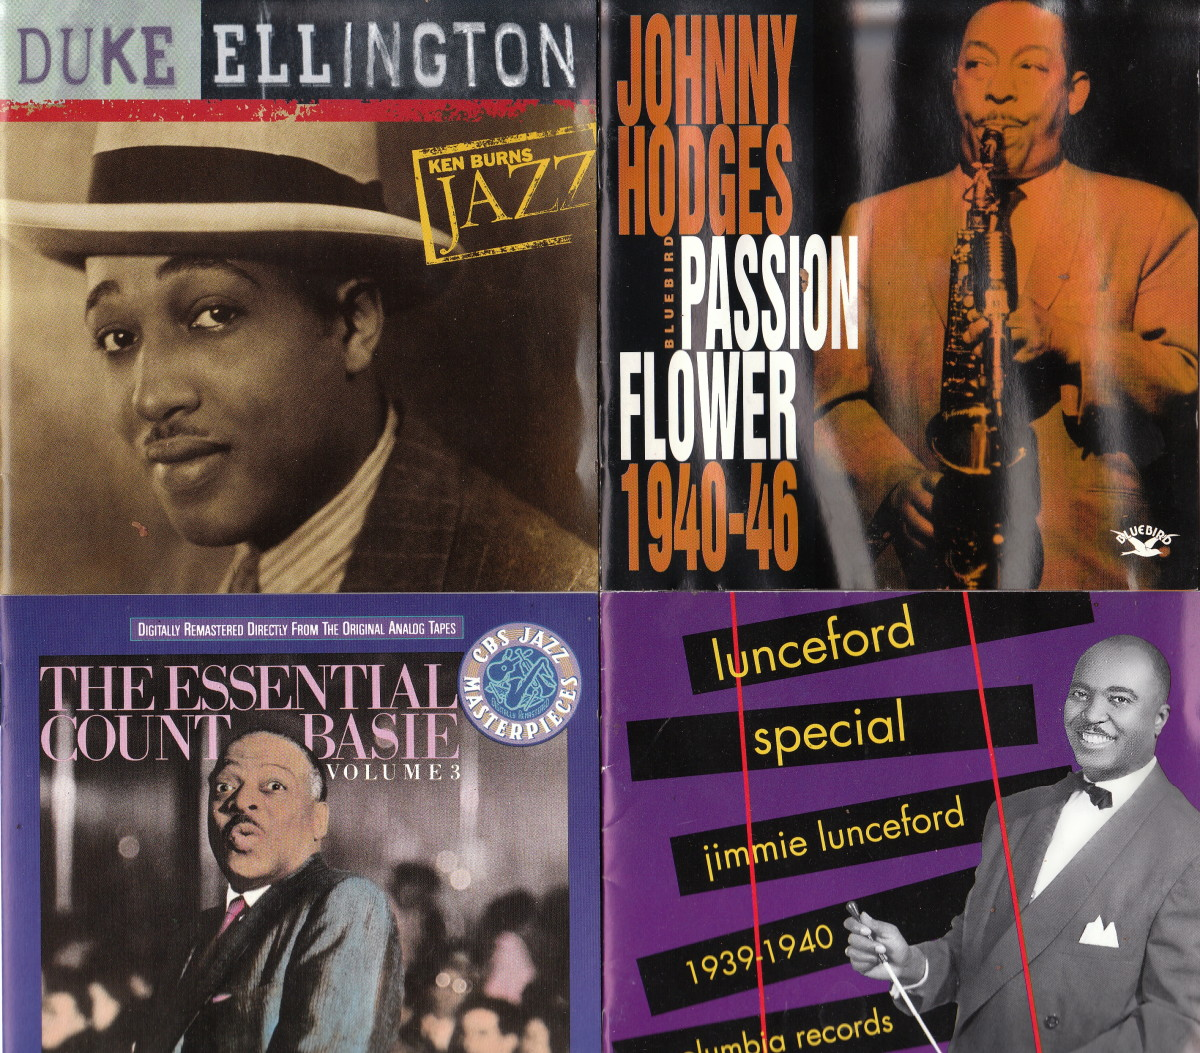 Clockwise: Duke Ellington; Johnny Hodges; Count Basie; Jimmie Lunceford